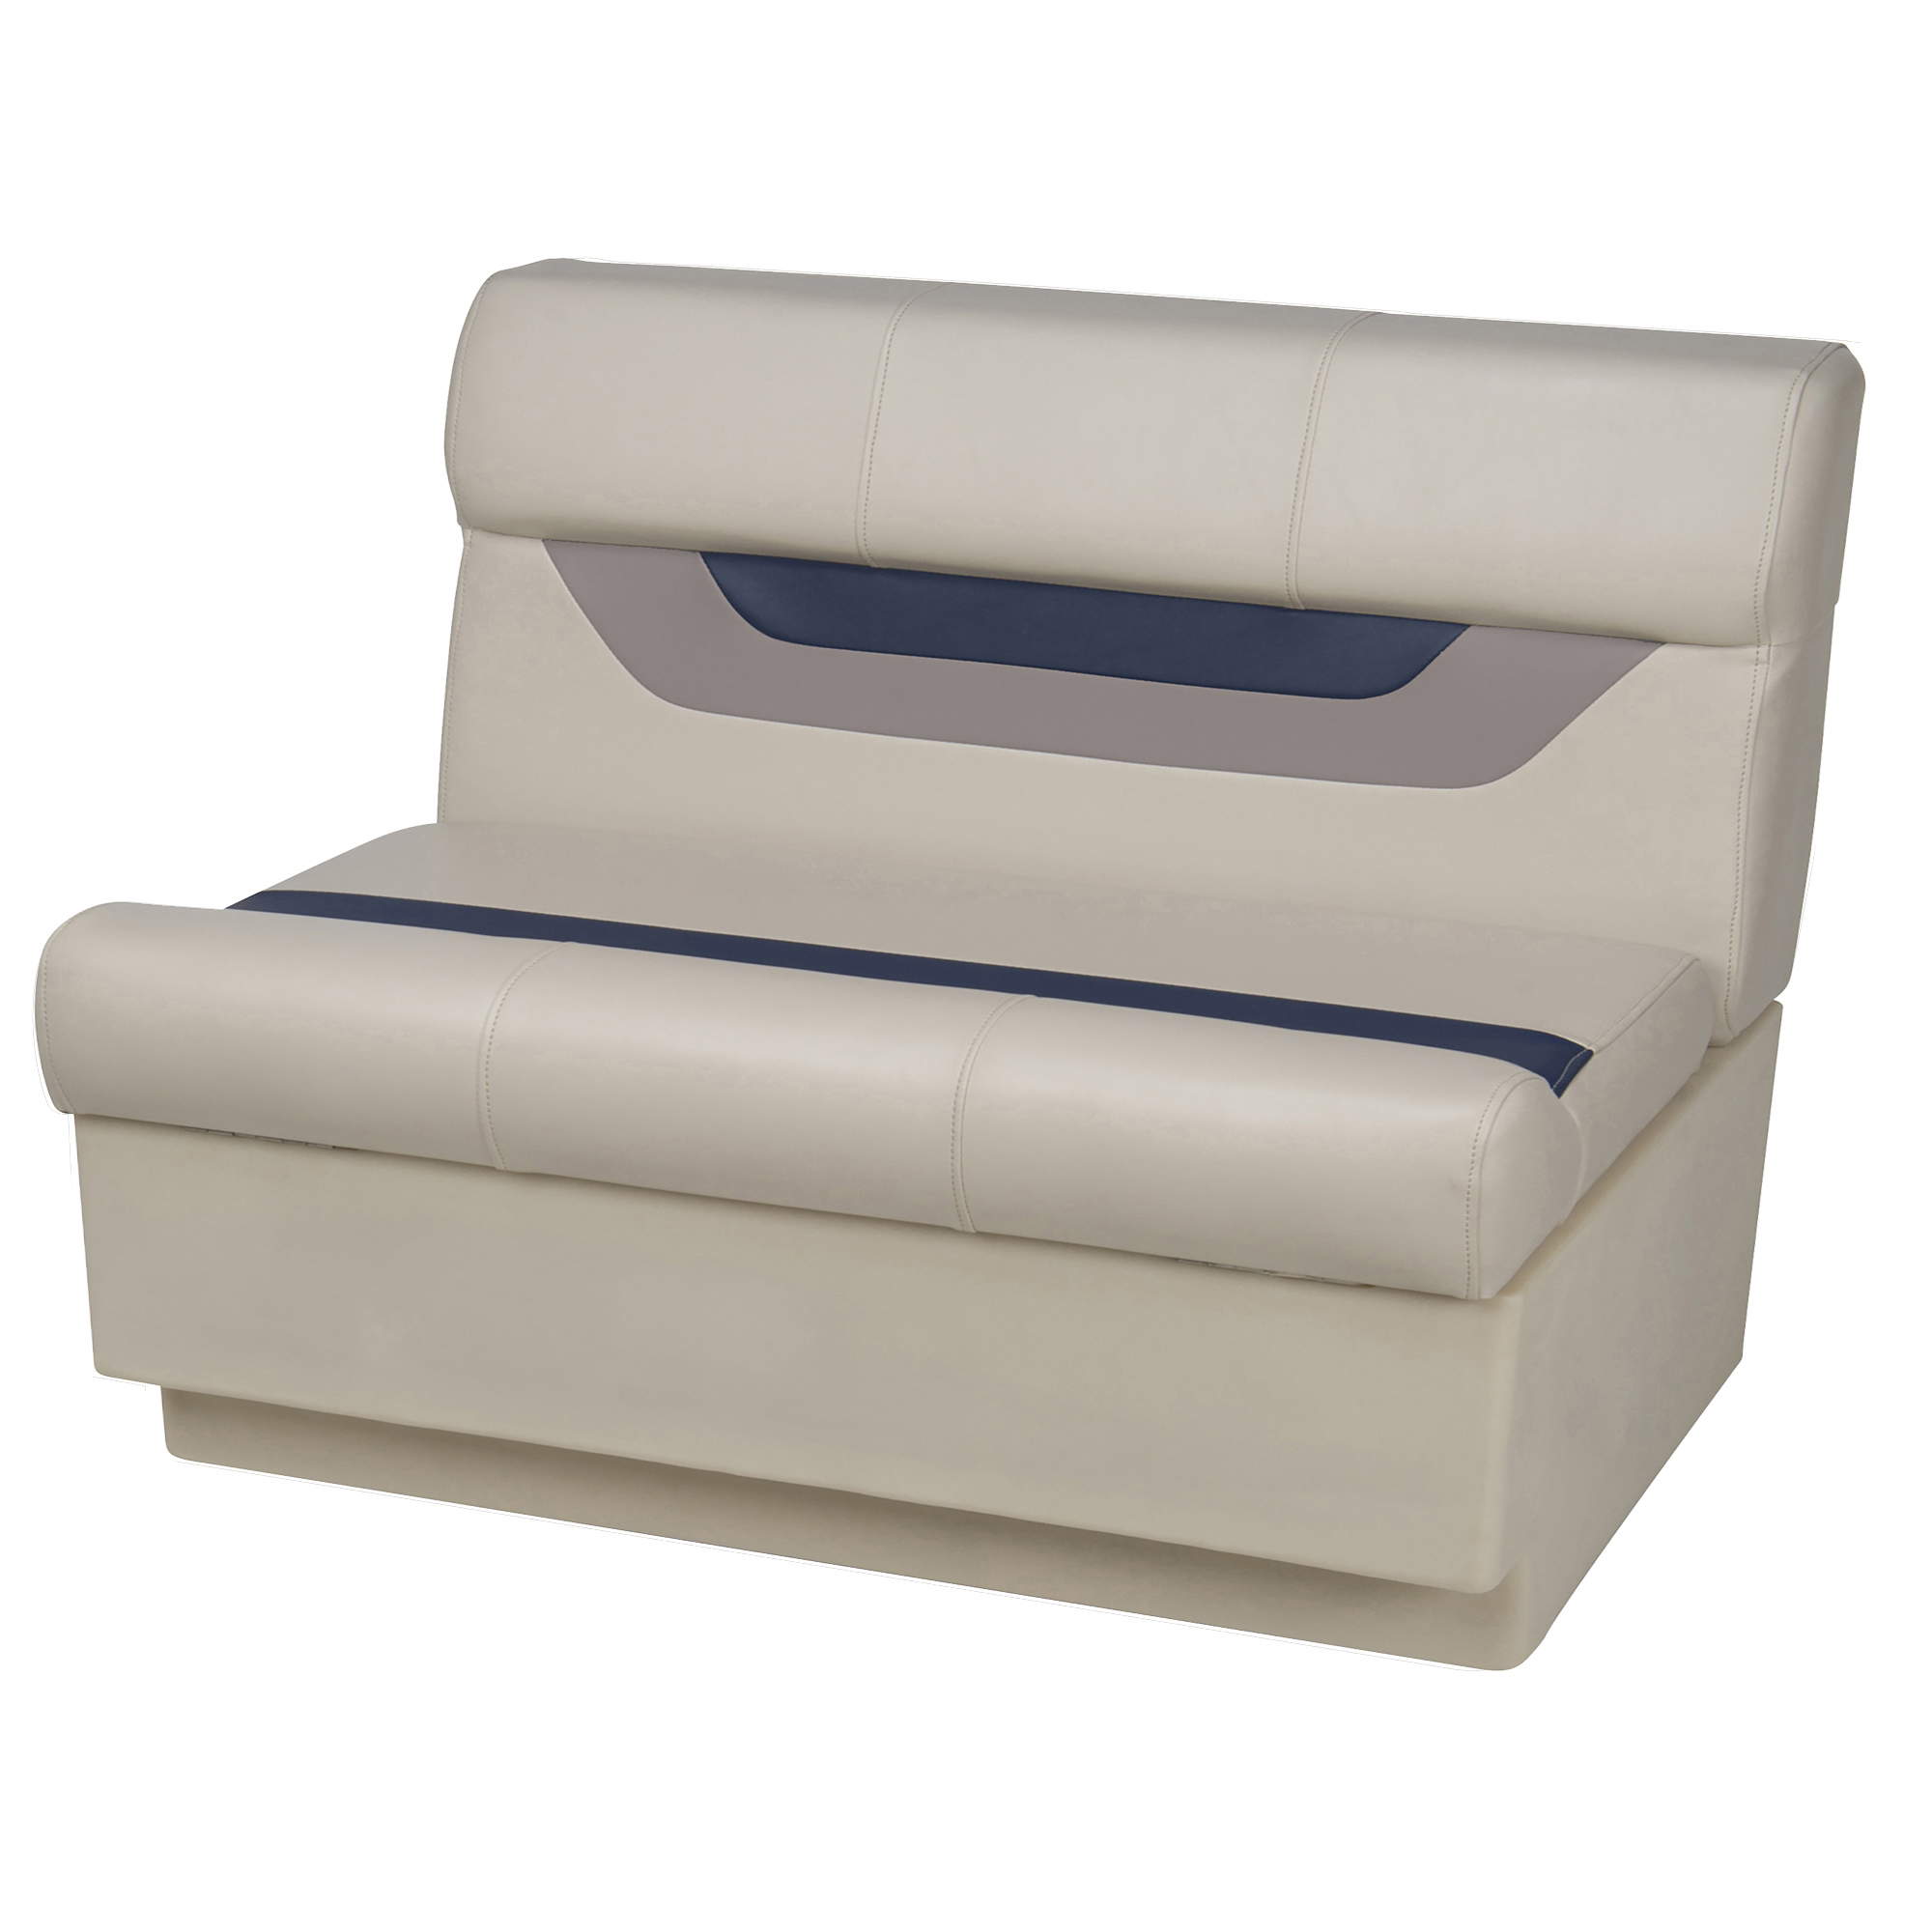 "Toonmate Designer Pontoon 36"" Wide Bench Seat - TOP ONLY - Platinum/Midnight/Mocha"